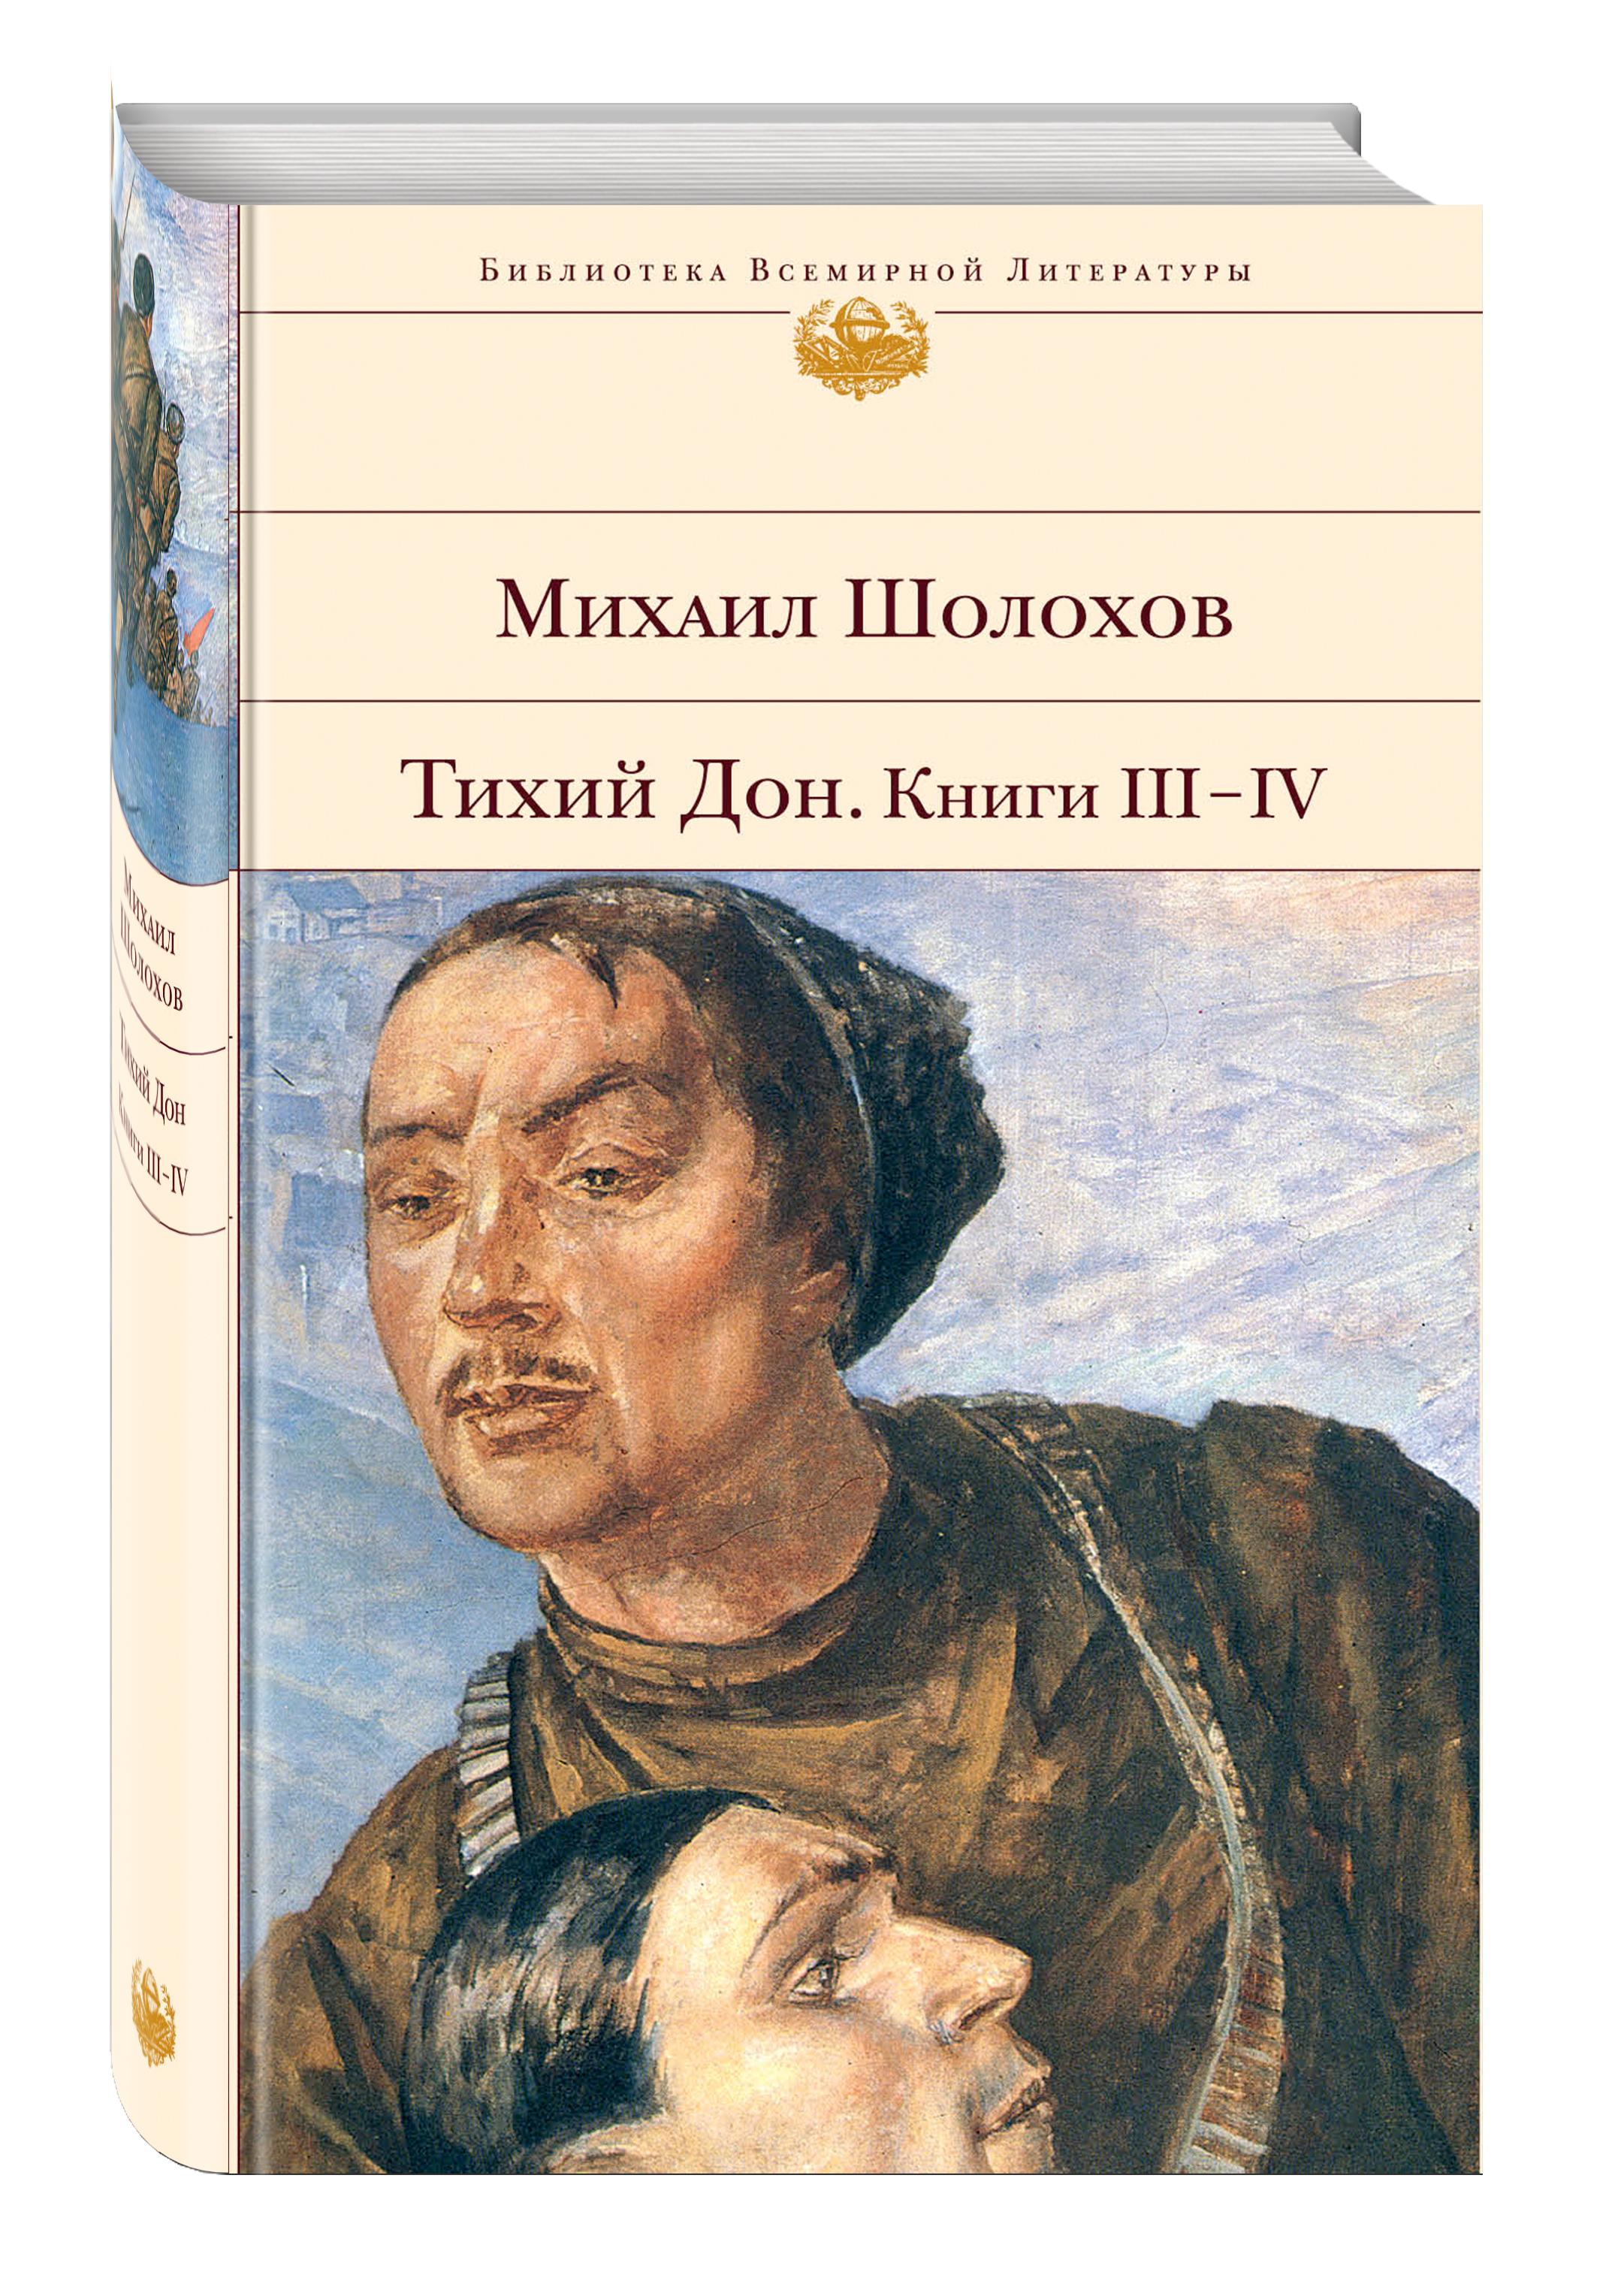 Михаил Шолохов Тихий Дон. Книги III-IV книги эксмо тихий дон книги iii iv